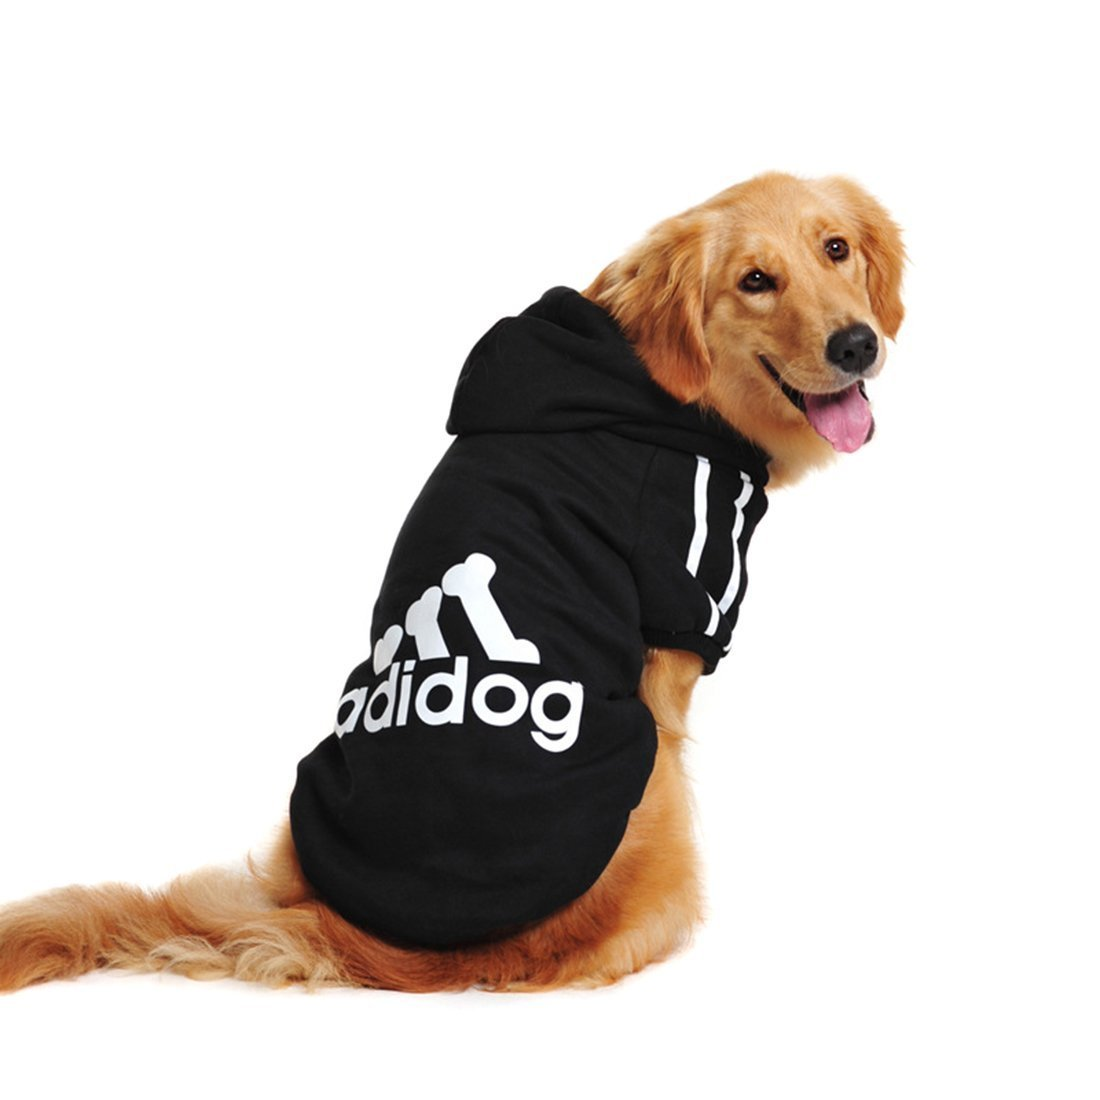 FuzzyGreen Dog Hoodie, Cozy Soft Sweatshirt Sweater Clothing for Medium Large Pet Dog (Black,3XL)